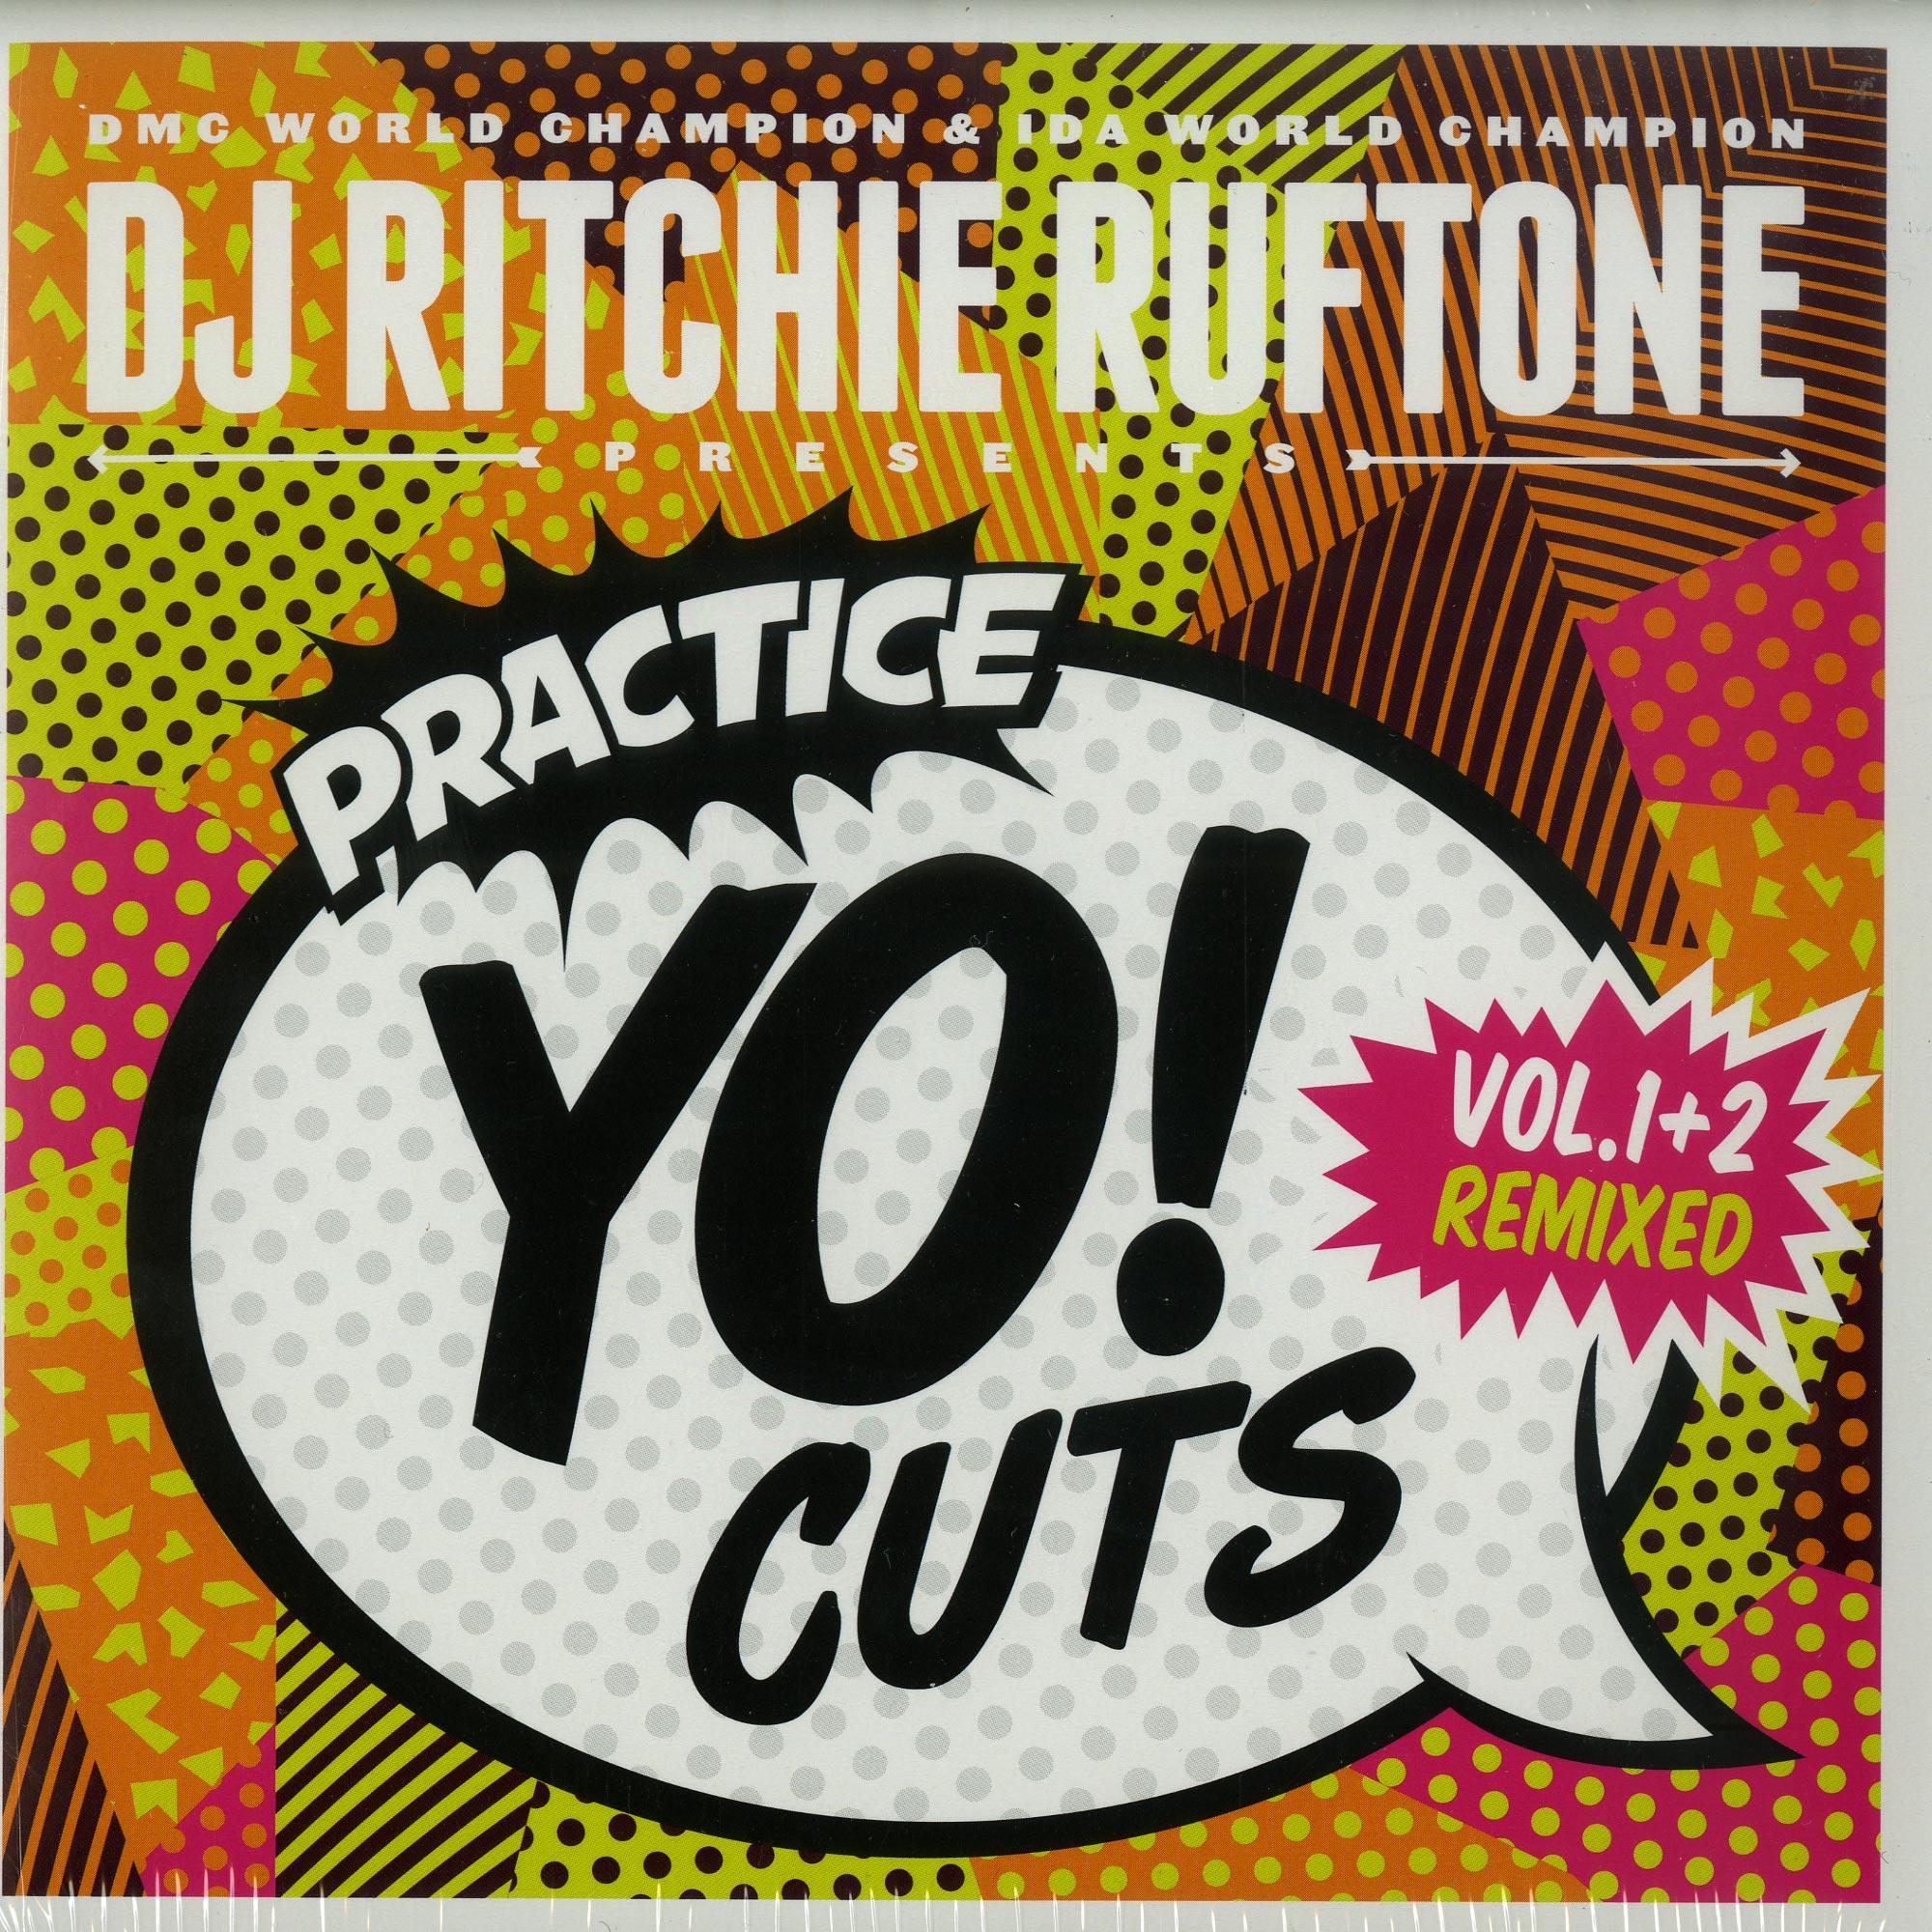 DJ Ritchie Ruftone - PRACTISE YO CUTS!